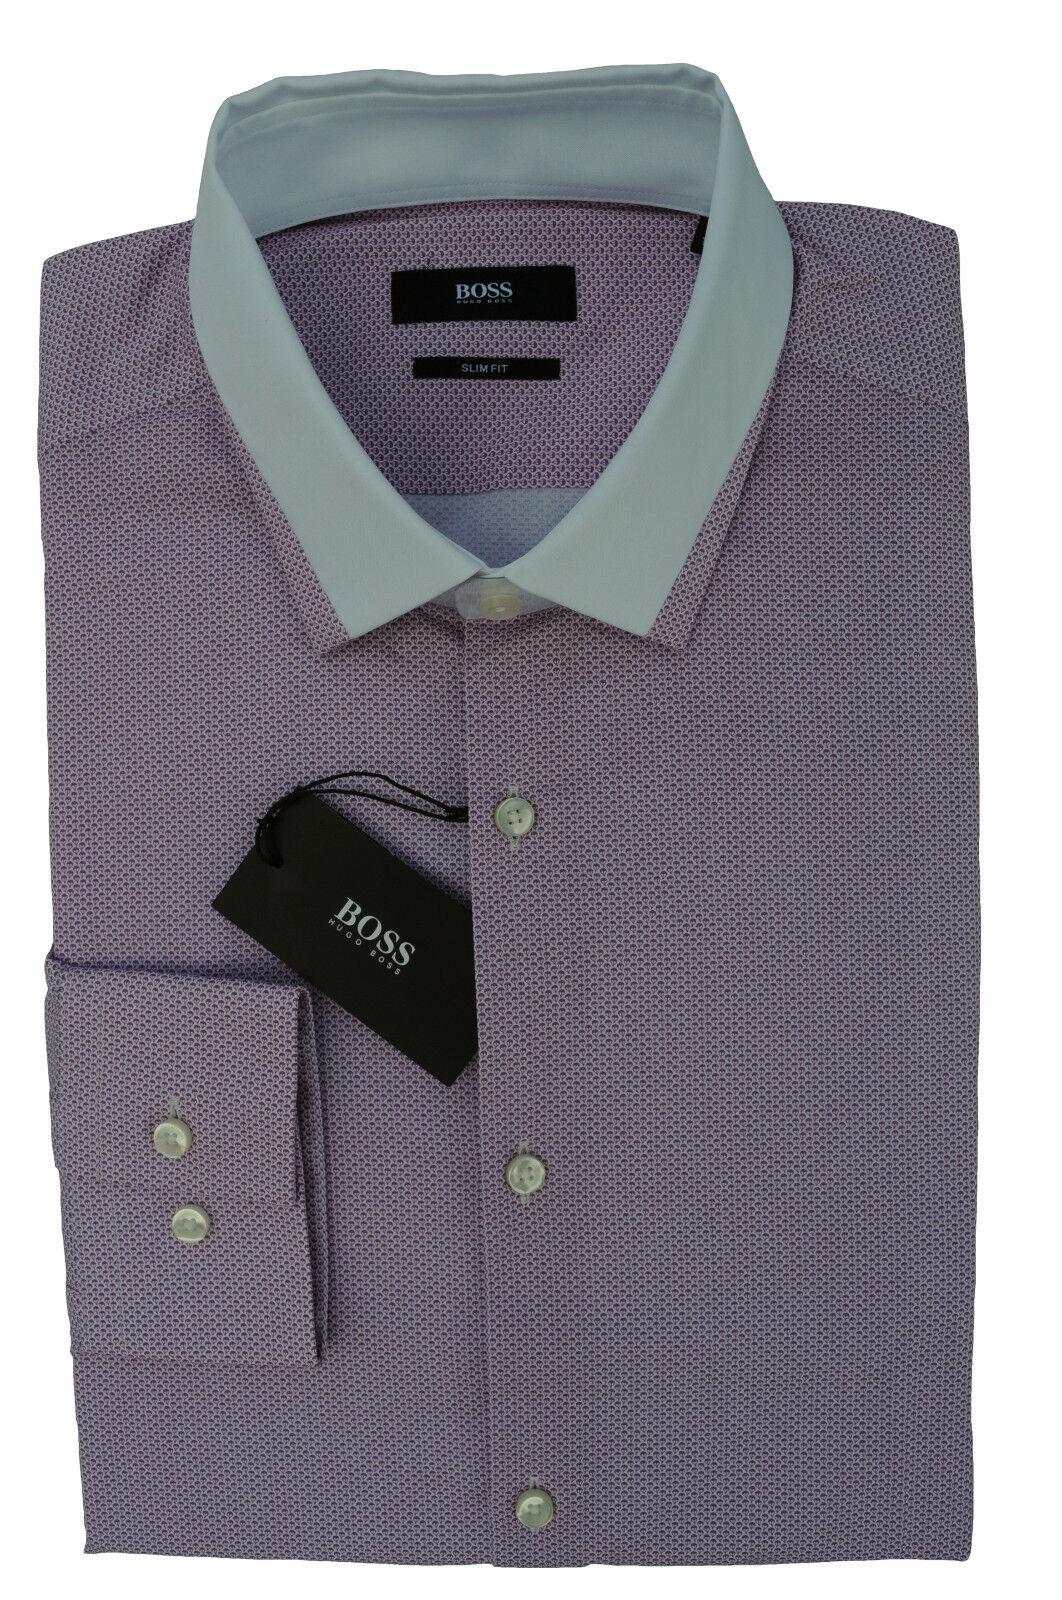 40 hugo boss Med-Pink camisa jerrell Med-Pink boss slim fit negro Label  50331459 a322e9 7a18dc63323d6